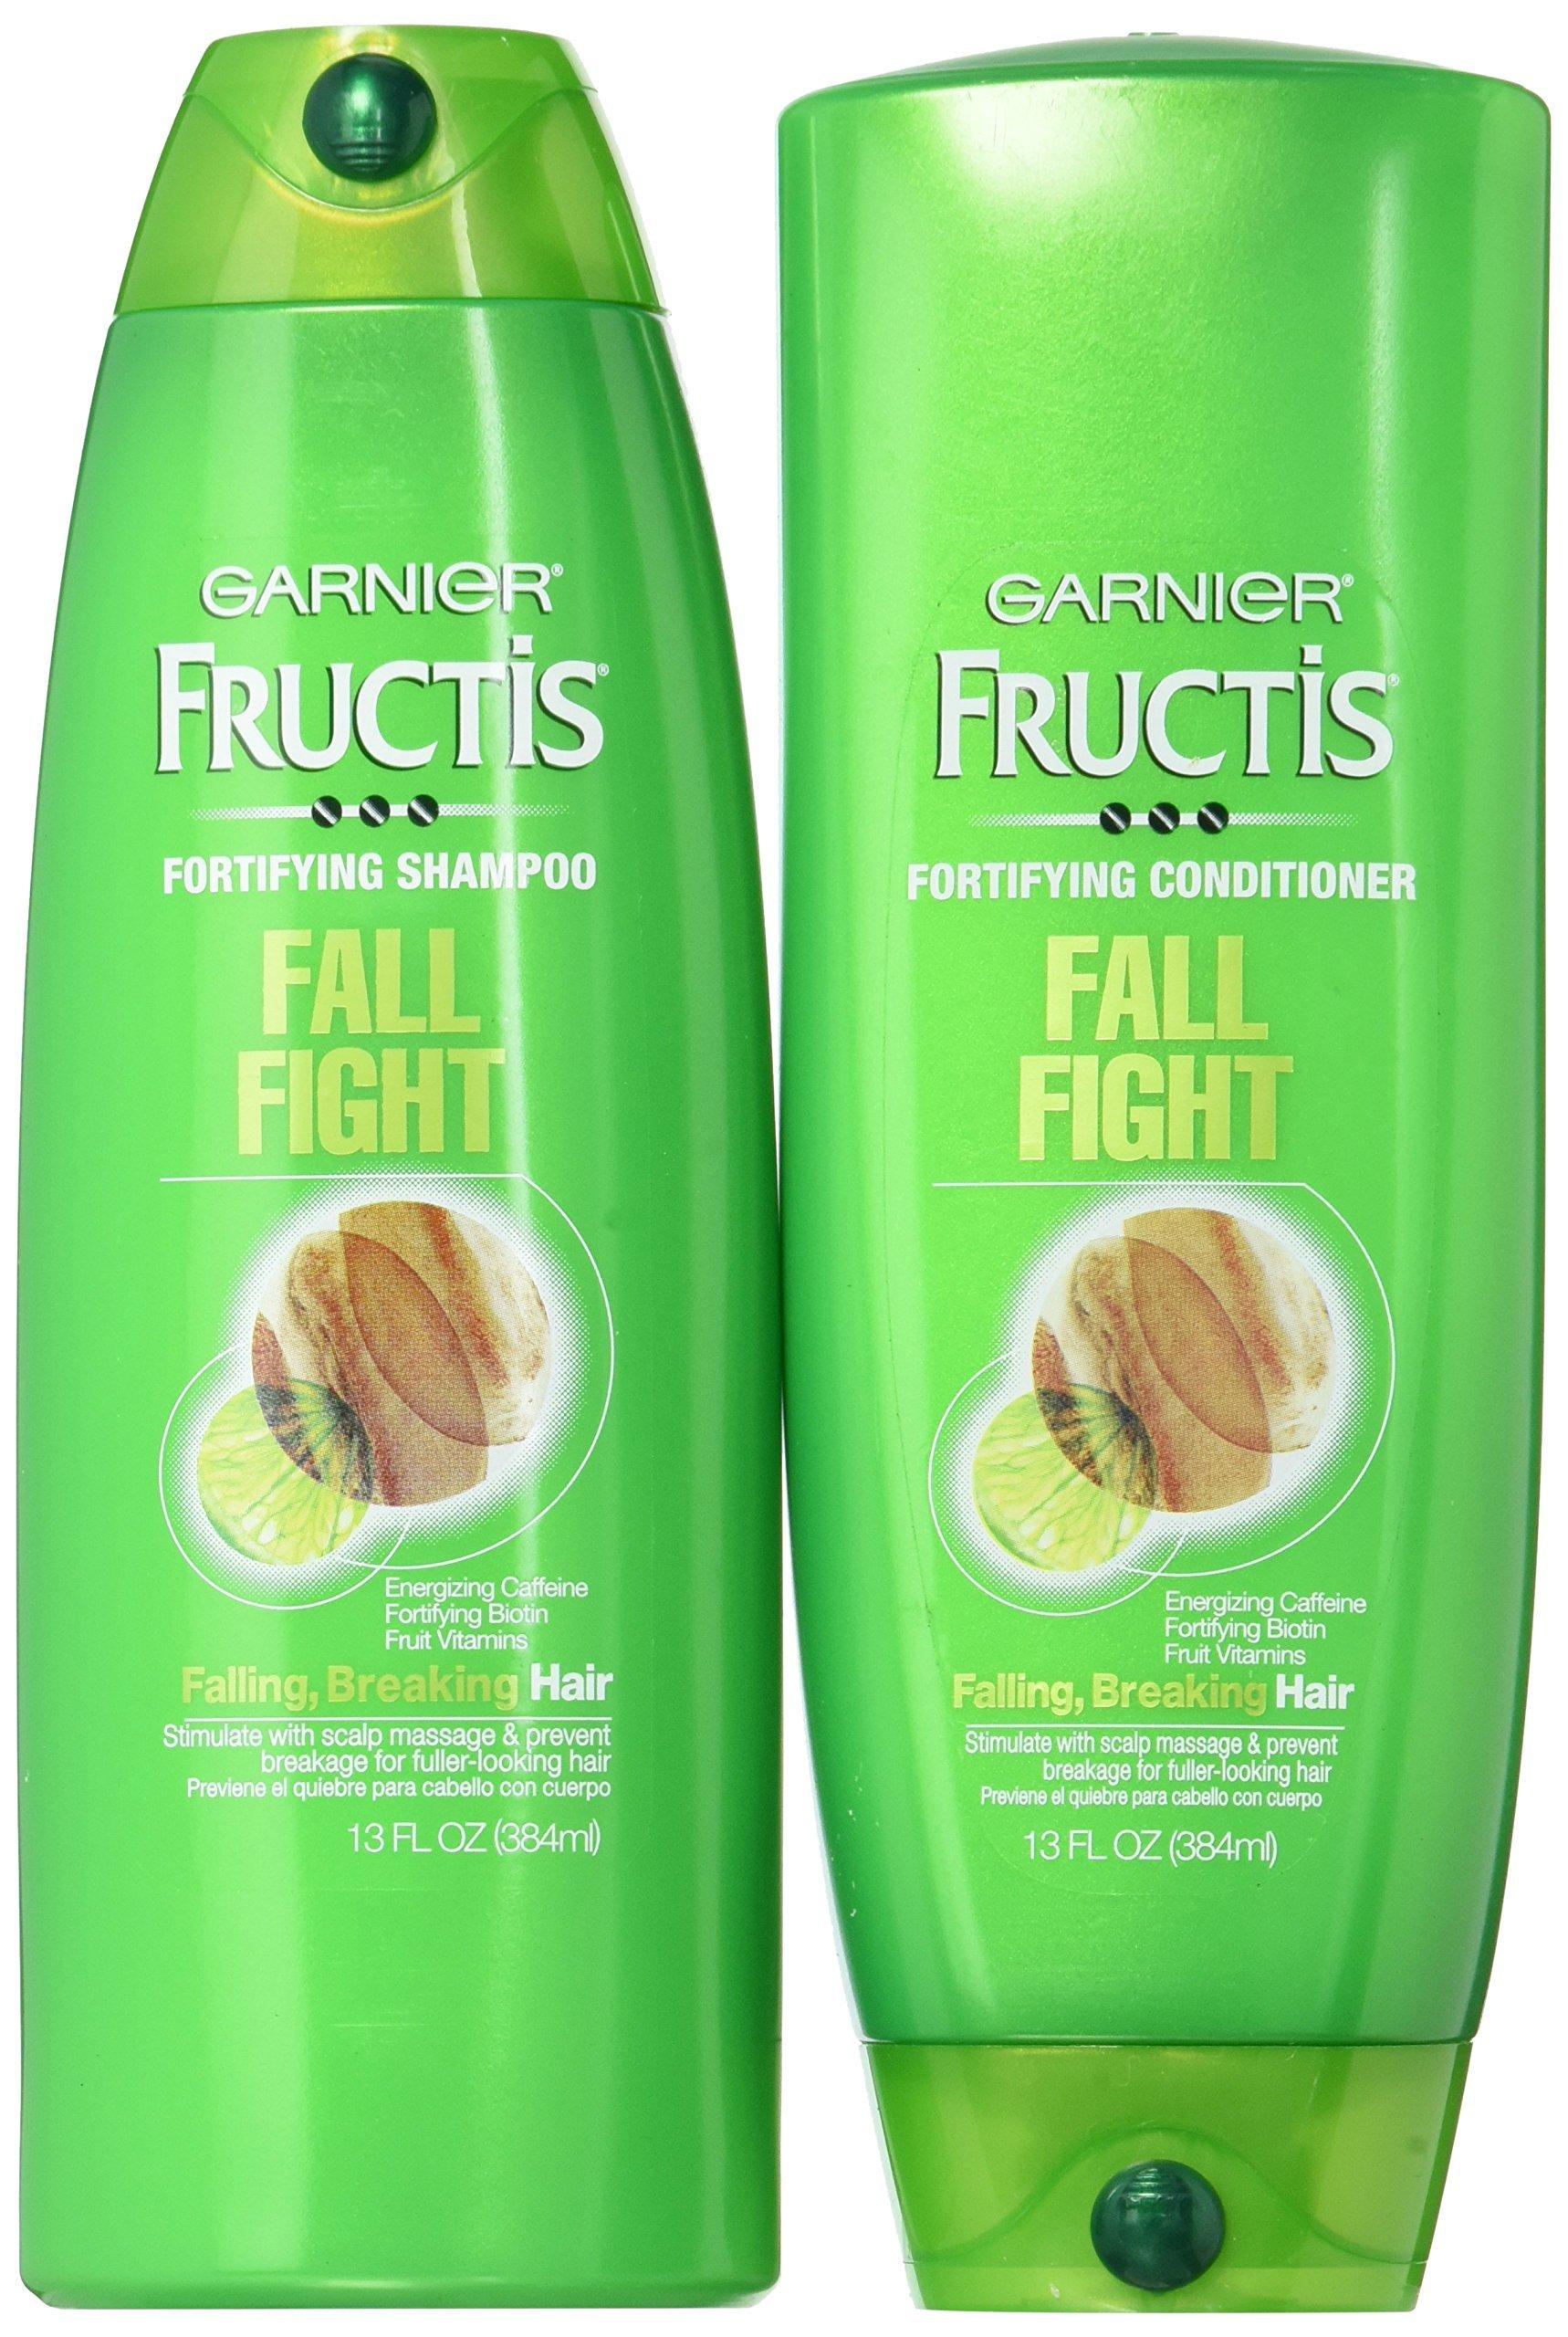 Amazon.com : Garnier Fructis Fall Fight Shampoo and ...